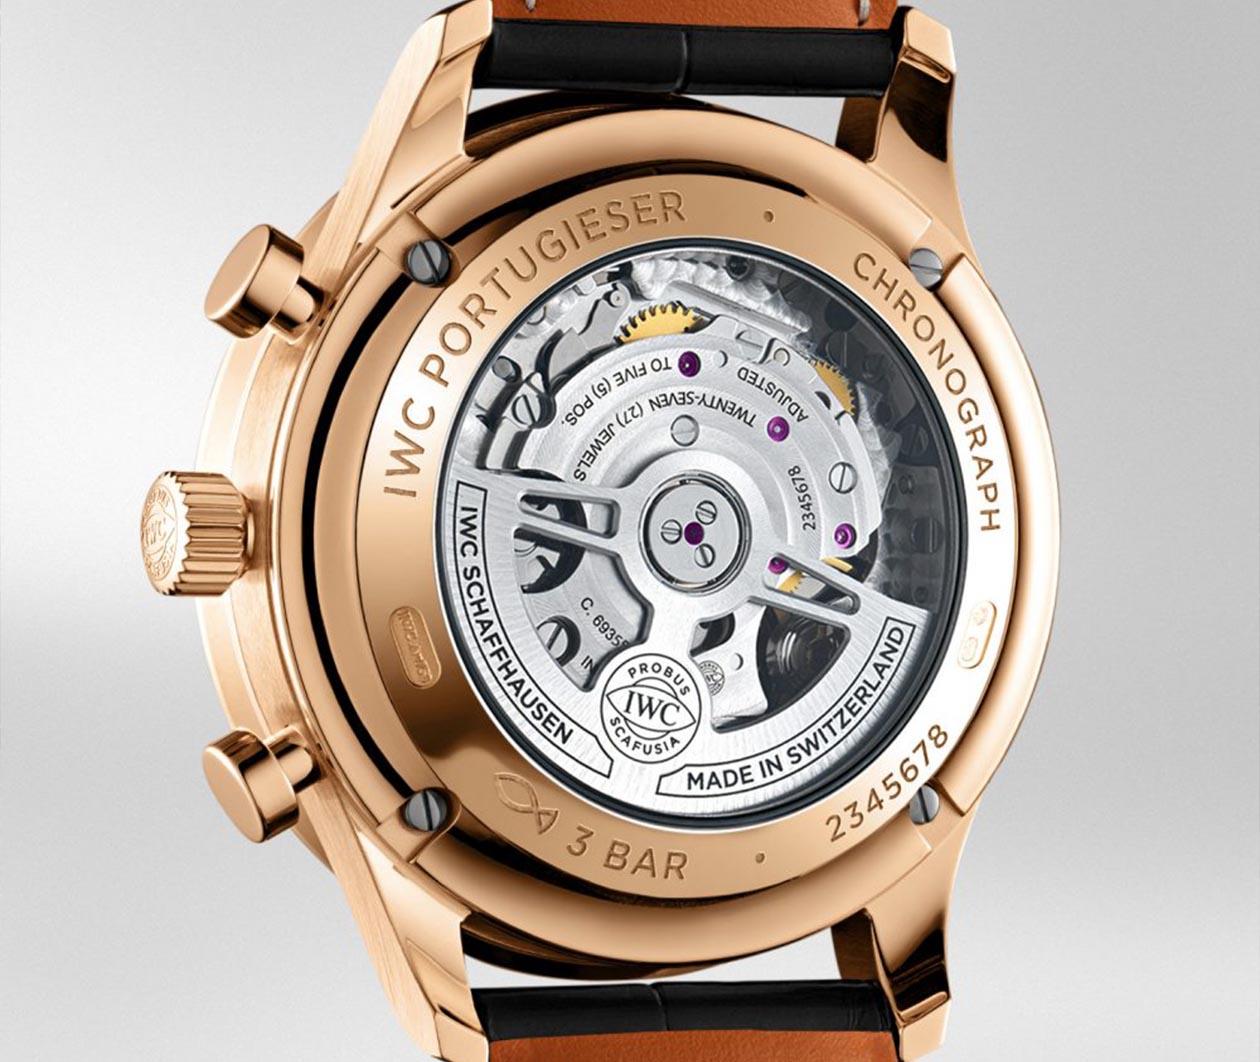 IWC Portugieser Chronograph IW371610 Carousel 5 FINAL